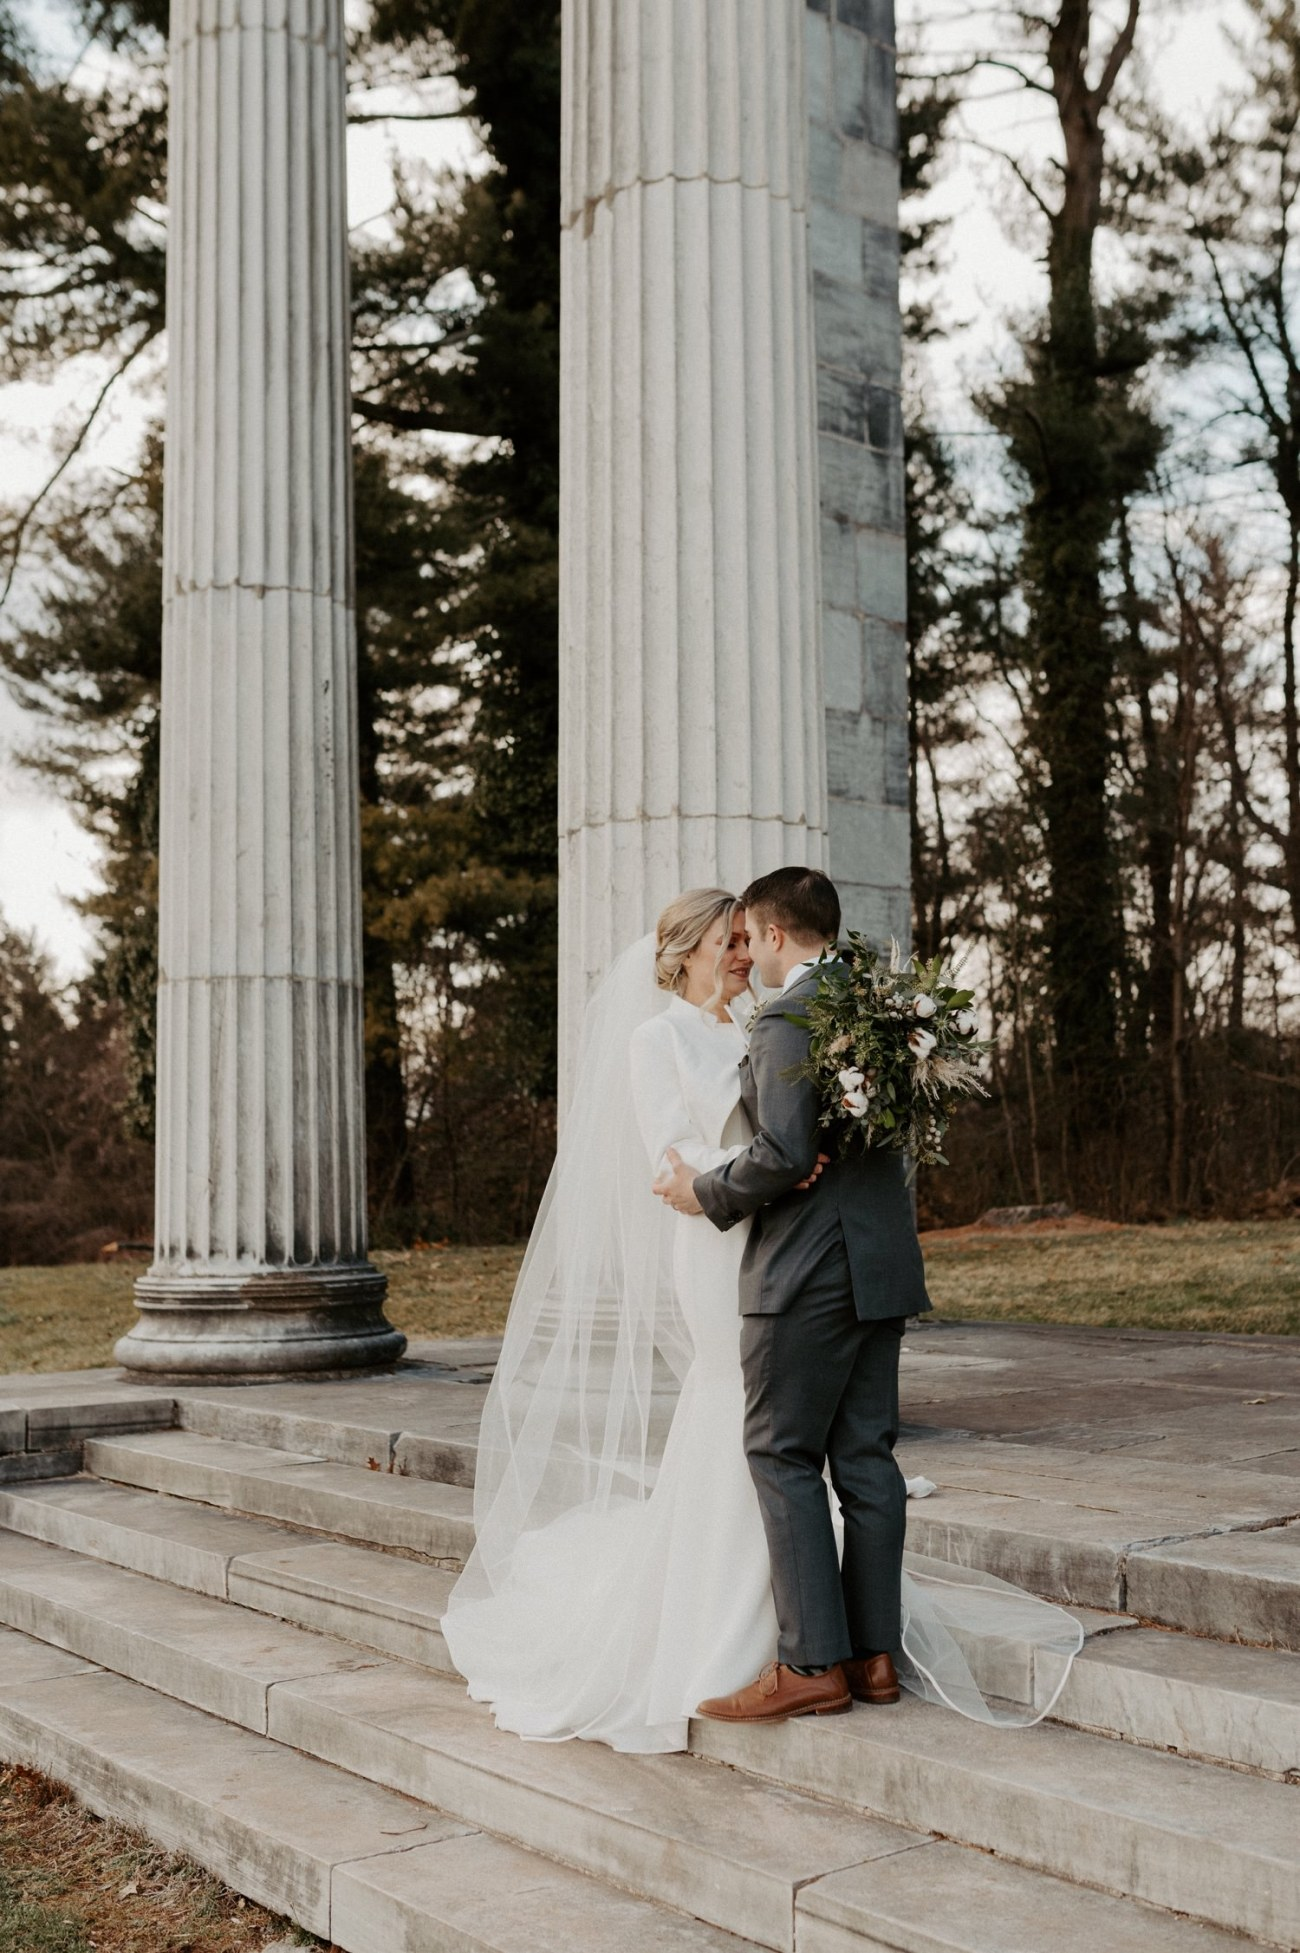 Princeton Battlefield Wedding Princeton University Elopement New Jersey Wedding Photographer Anais Possamai Photography 21